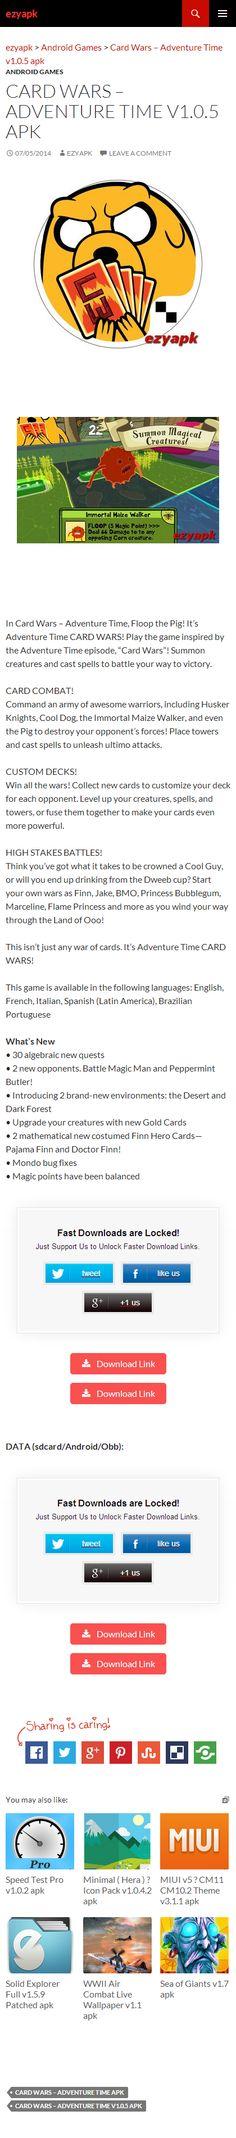 Adventure Time Card Wars - Record Thug - Useless Swamp Card card - time card